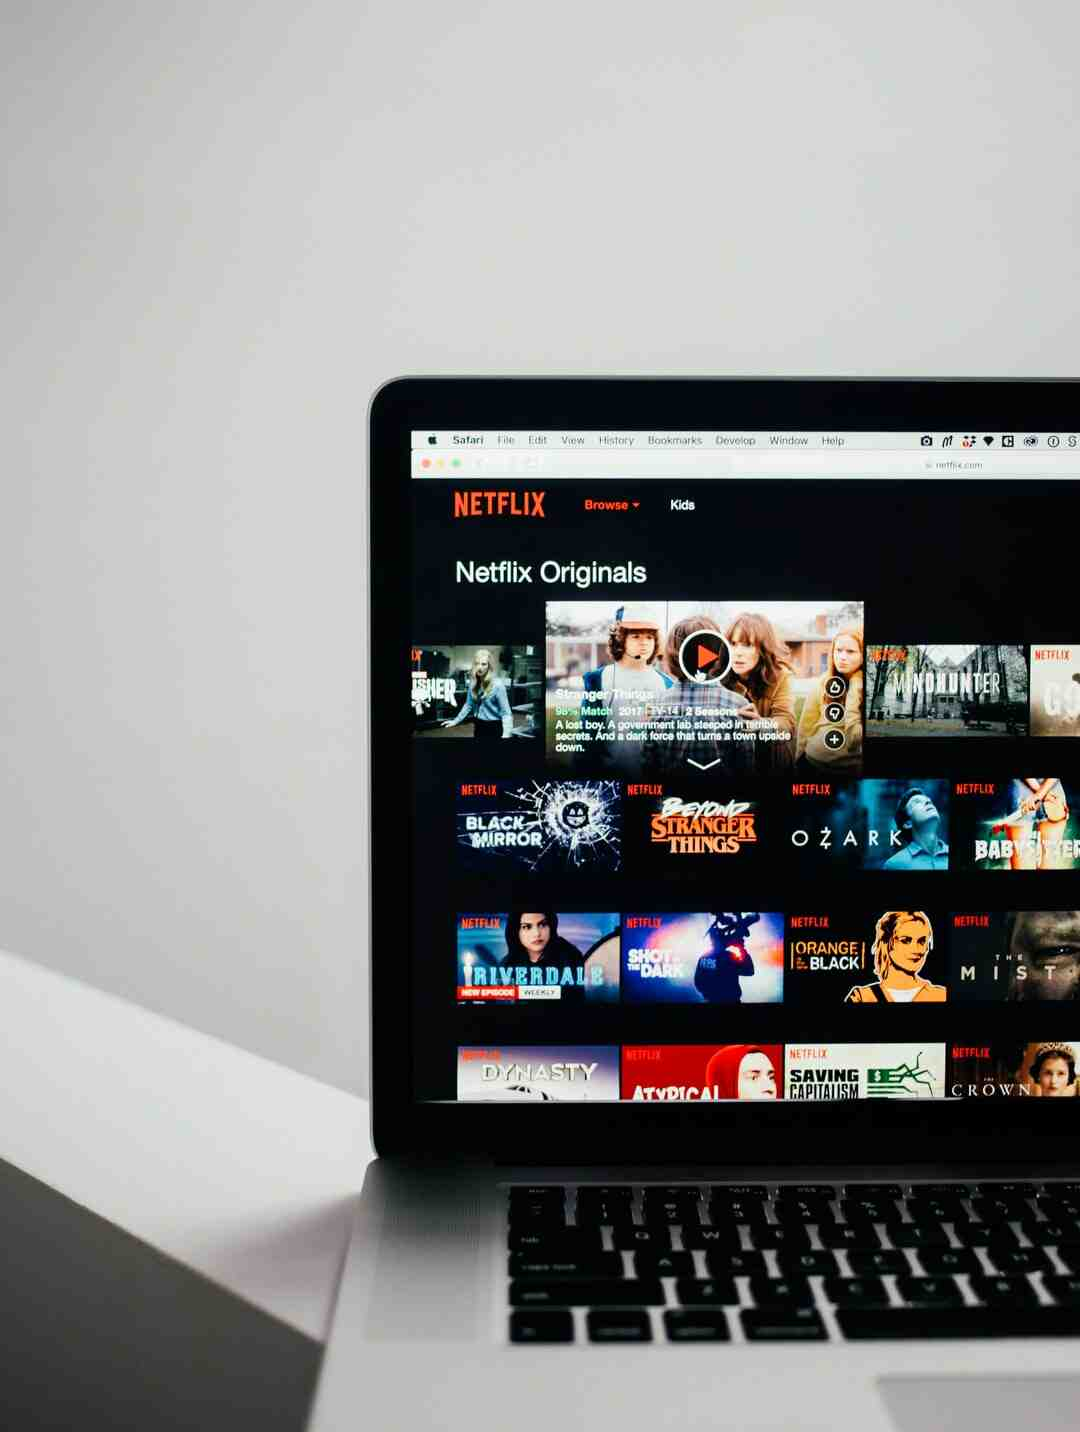 ¿Qué país da mes gratis Netflix?